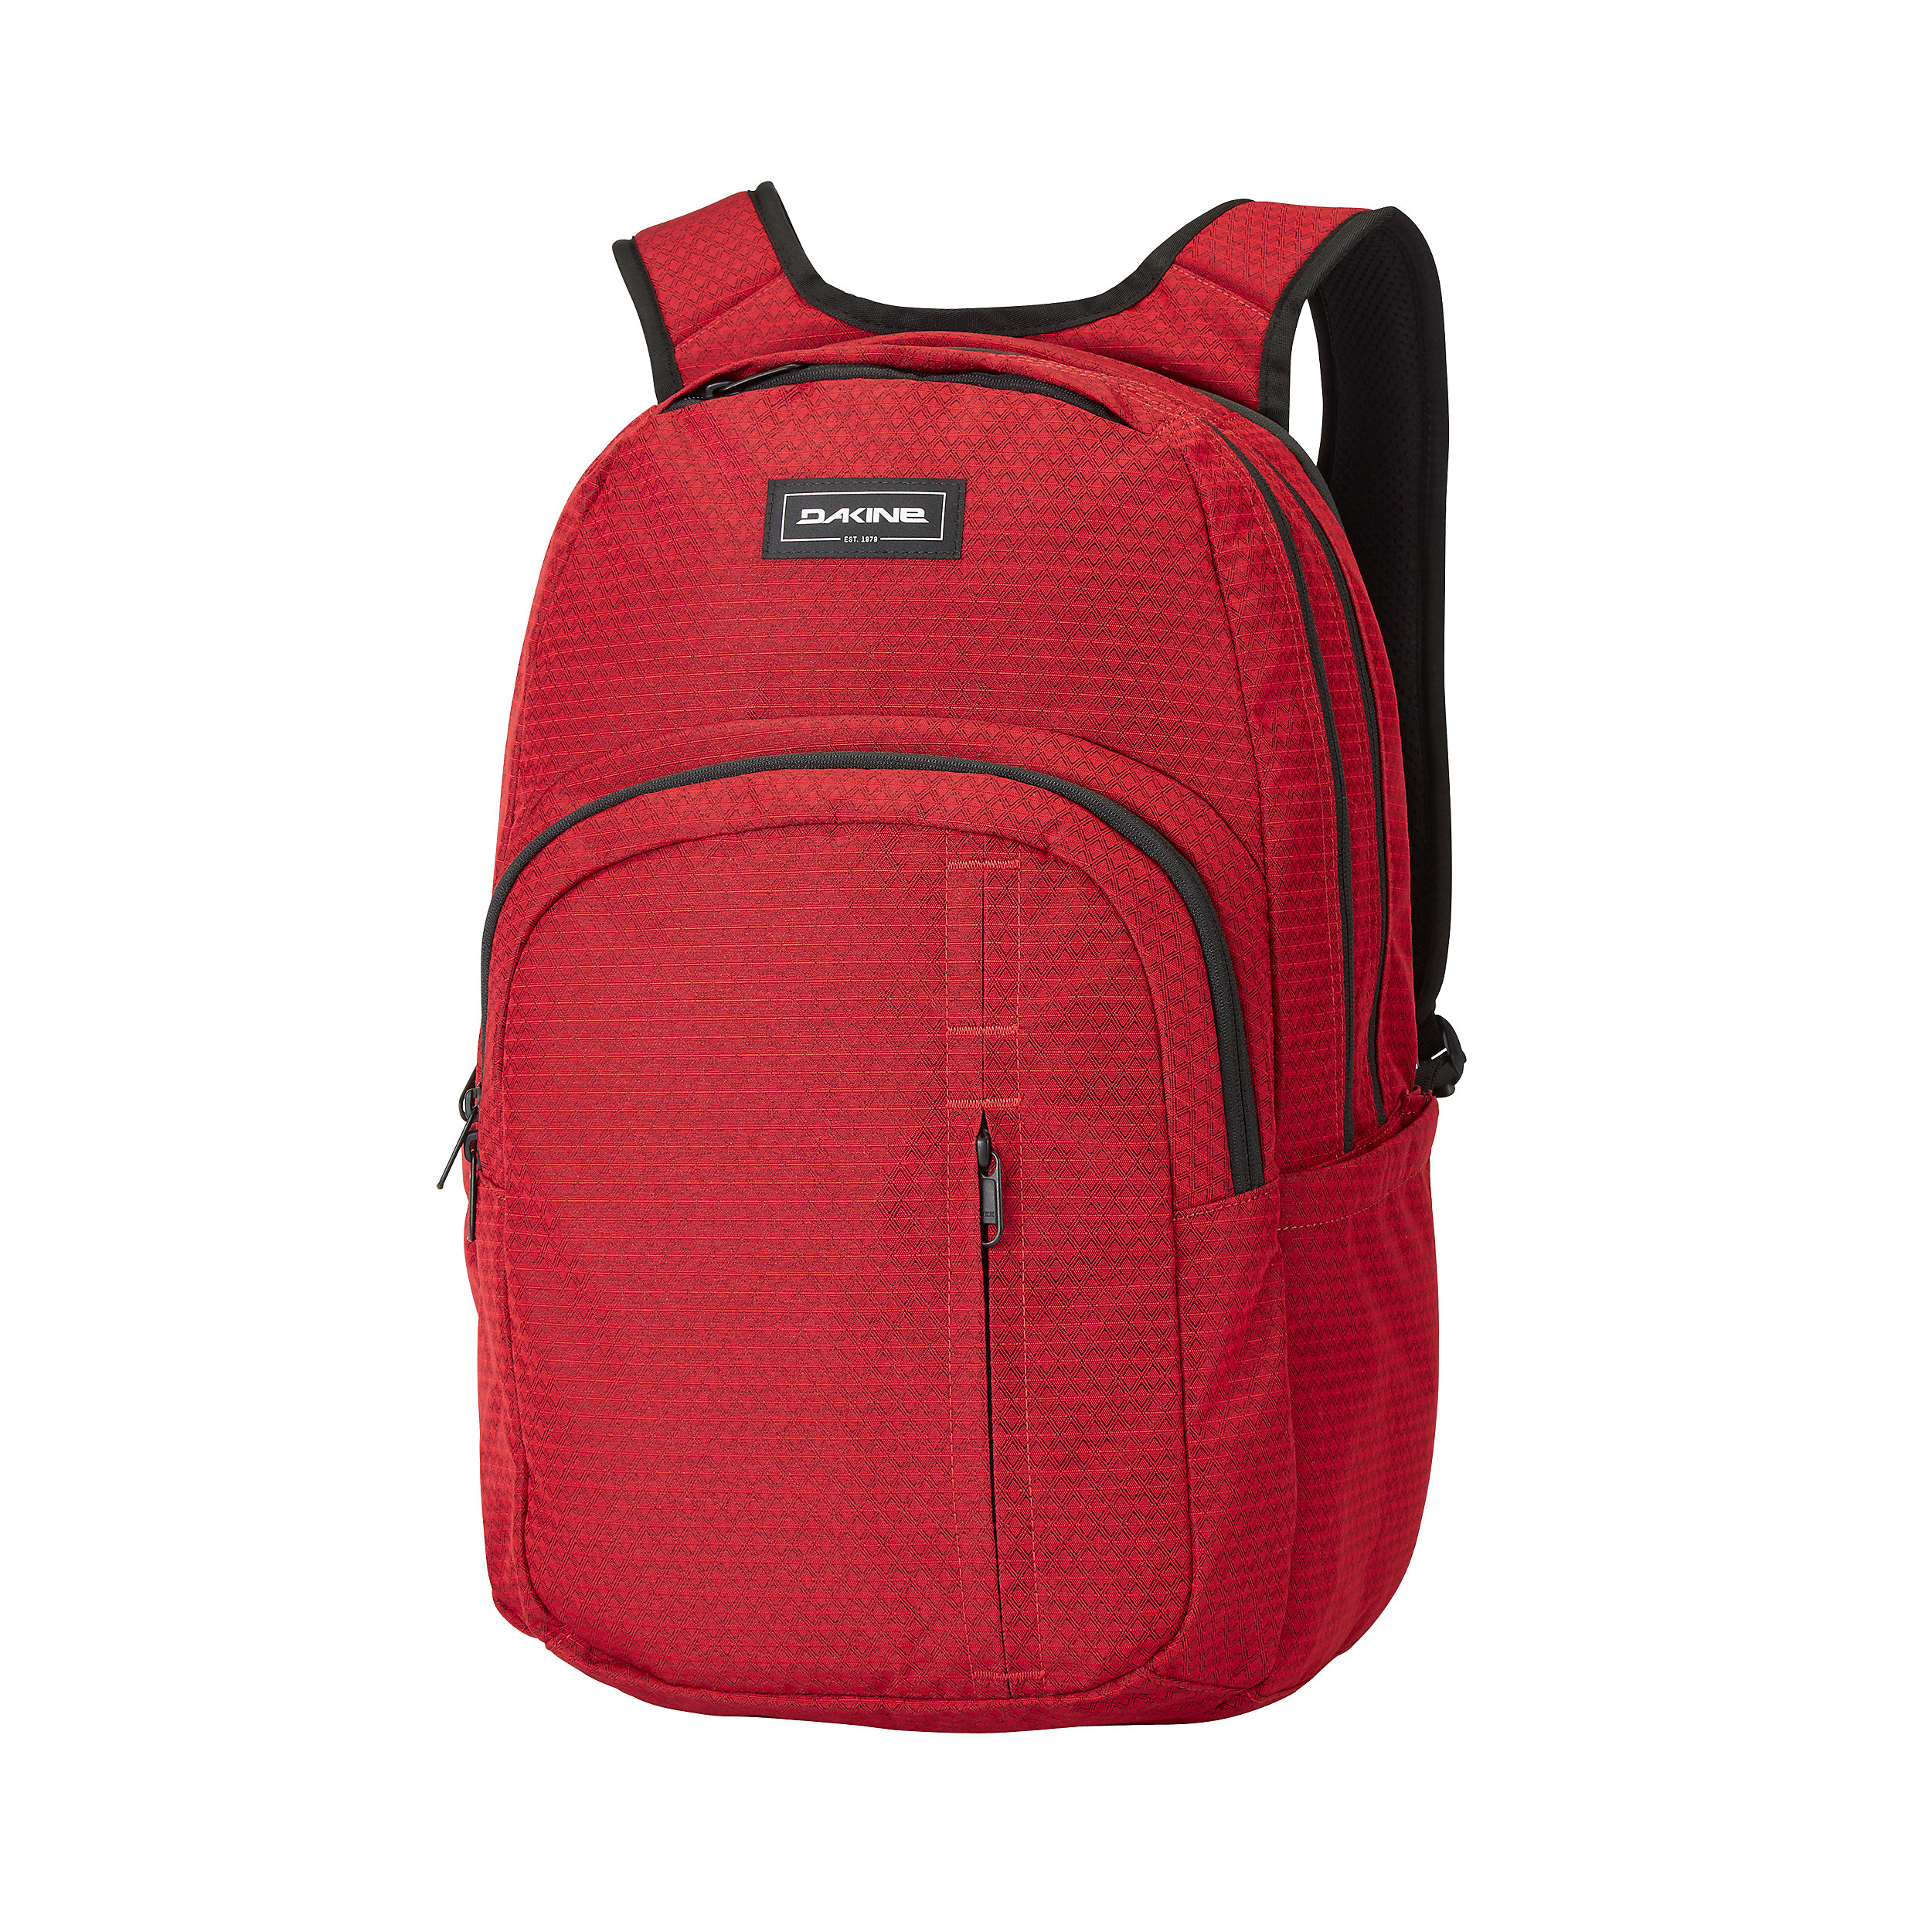 Rucksack Campus Premium 15 Zoll Packs L 28 Liter